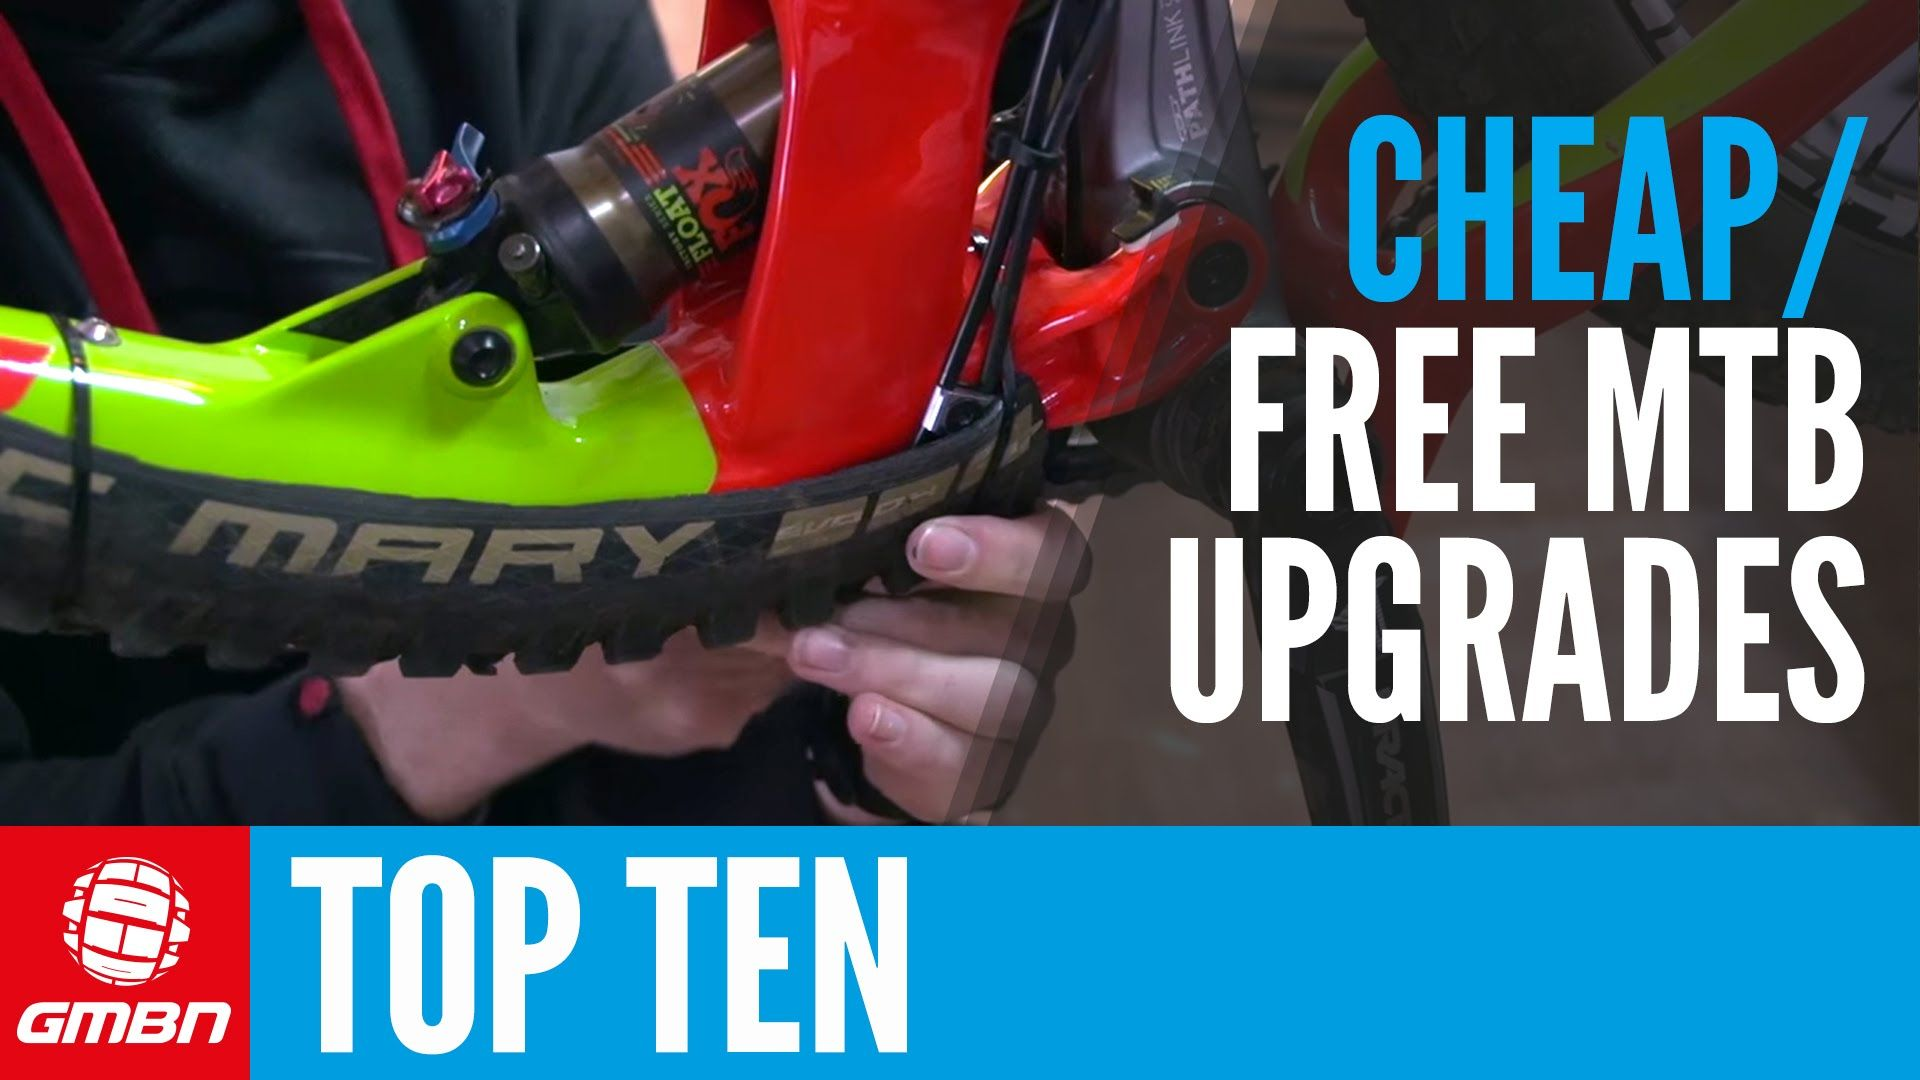 Top Ten Cheap Or Free Mtb Upgrades Bike Hacks Mountain Bike